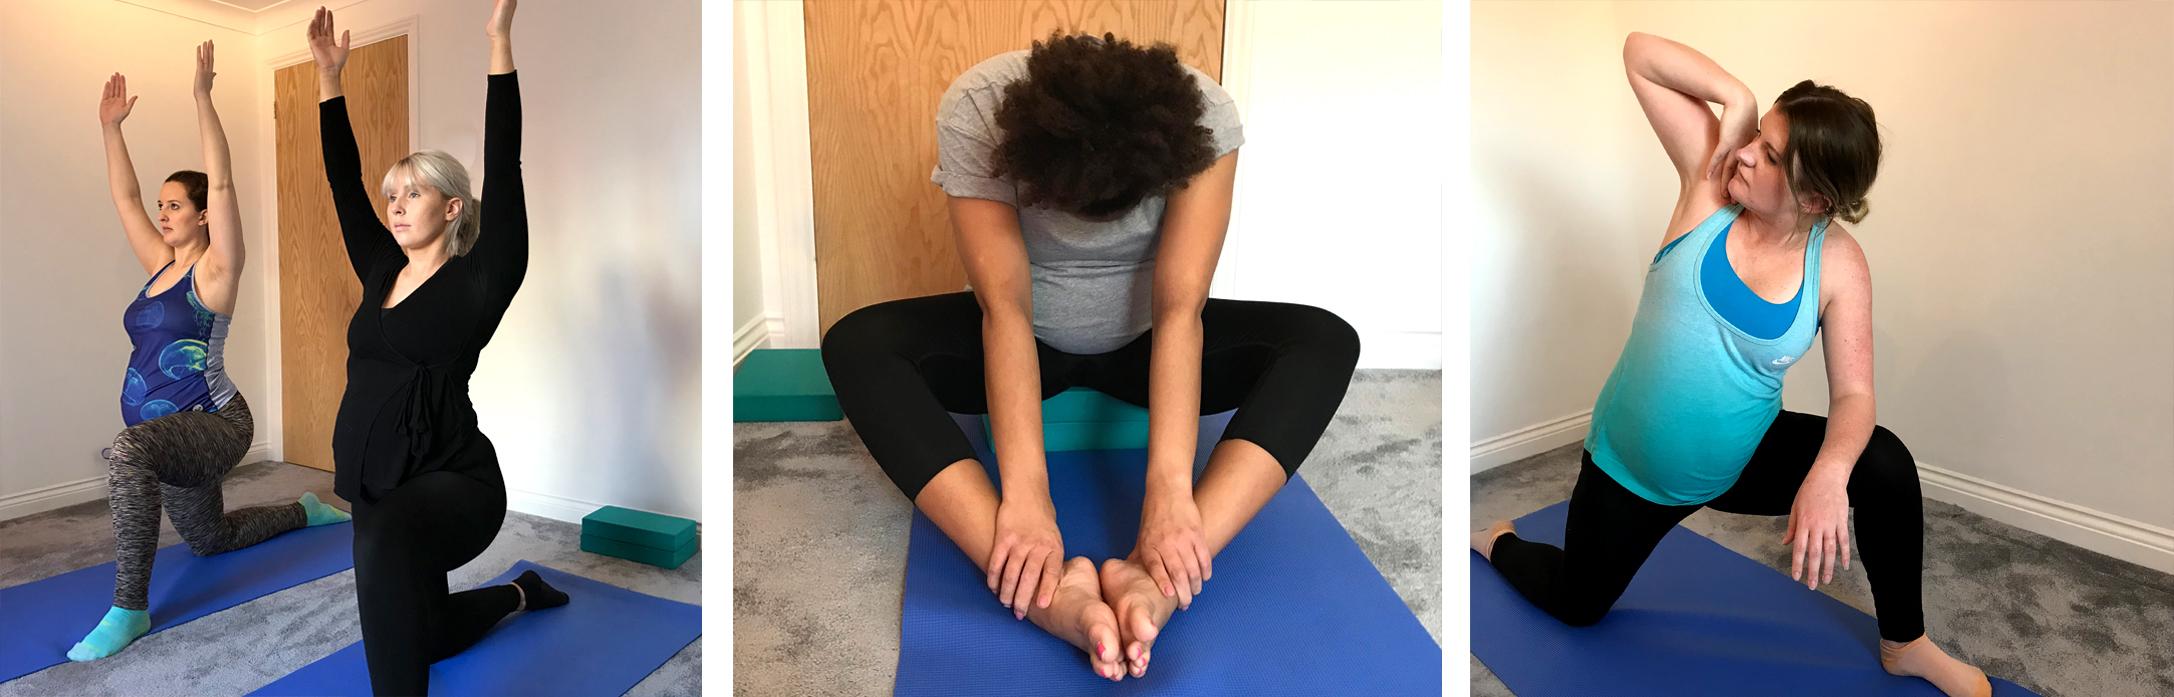 Pregnancy Yoga and Prenatal Yoga, Antenatal Yoga, Birth Preparation in Locks Heath, near Park Gate, Whiteley, Fareham, Southampton, Portsmouth, Hampshire,